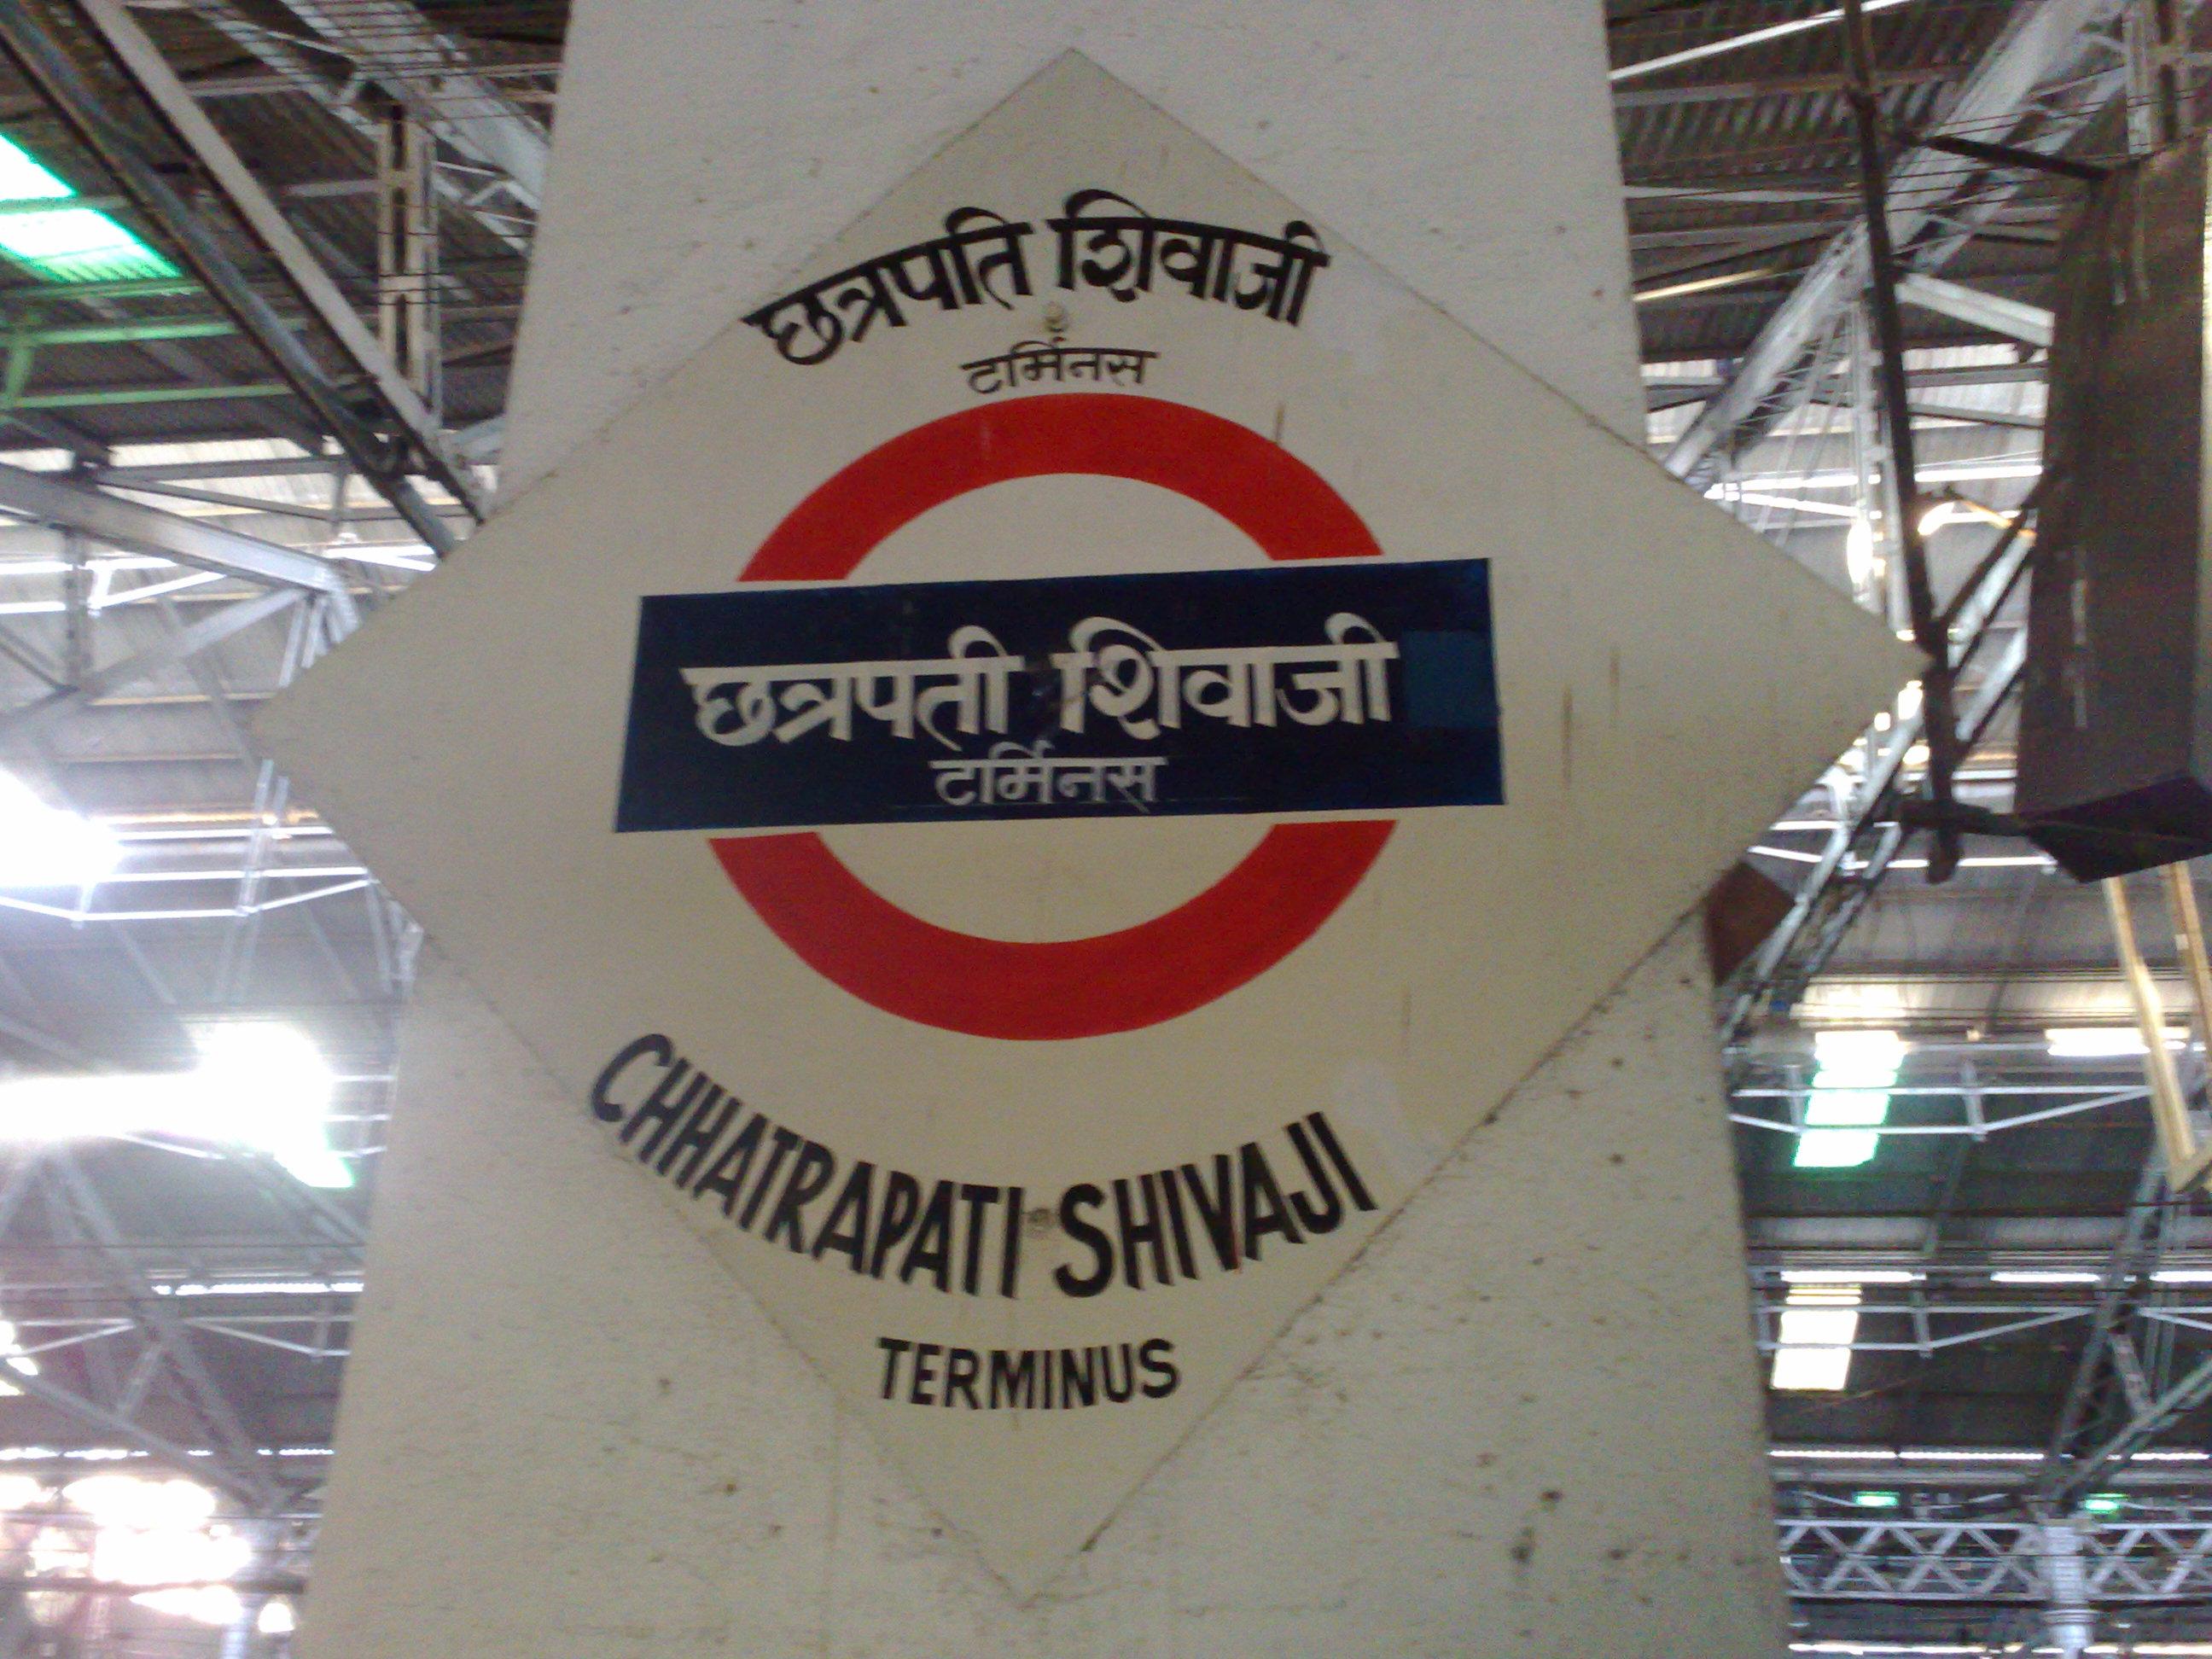 छत्रपती शिवाजी टर्मिनस, मुंबई